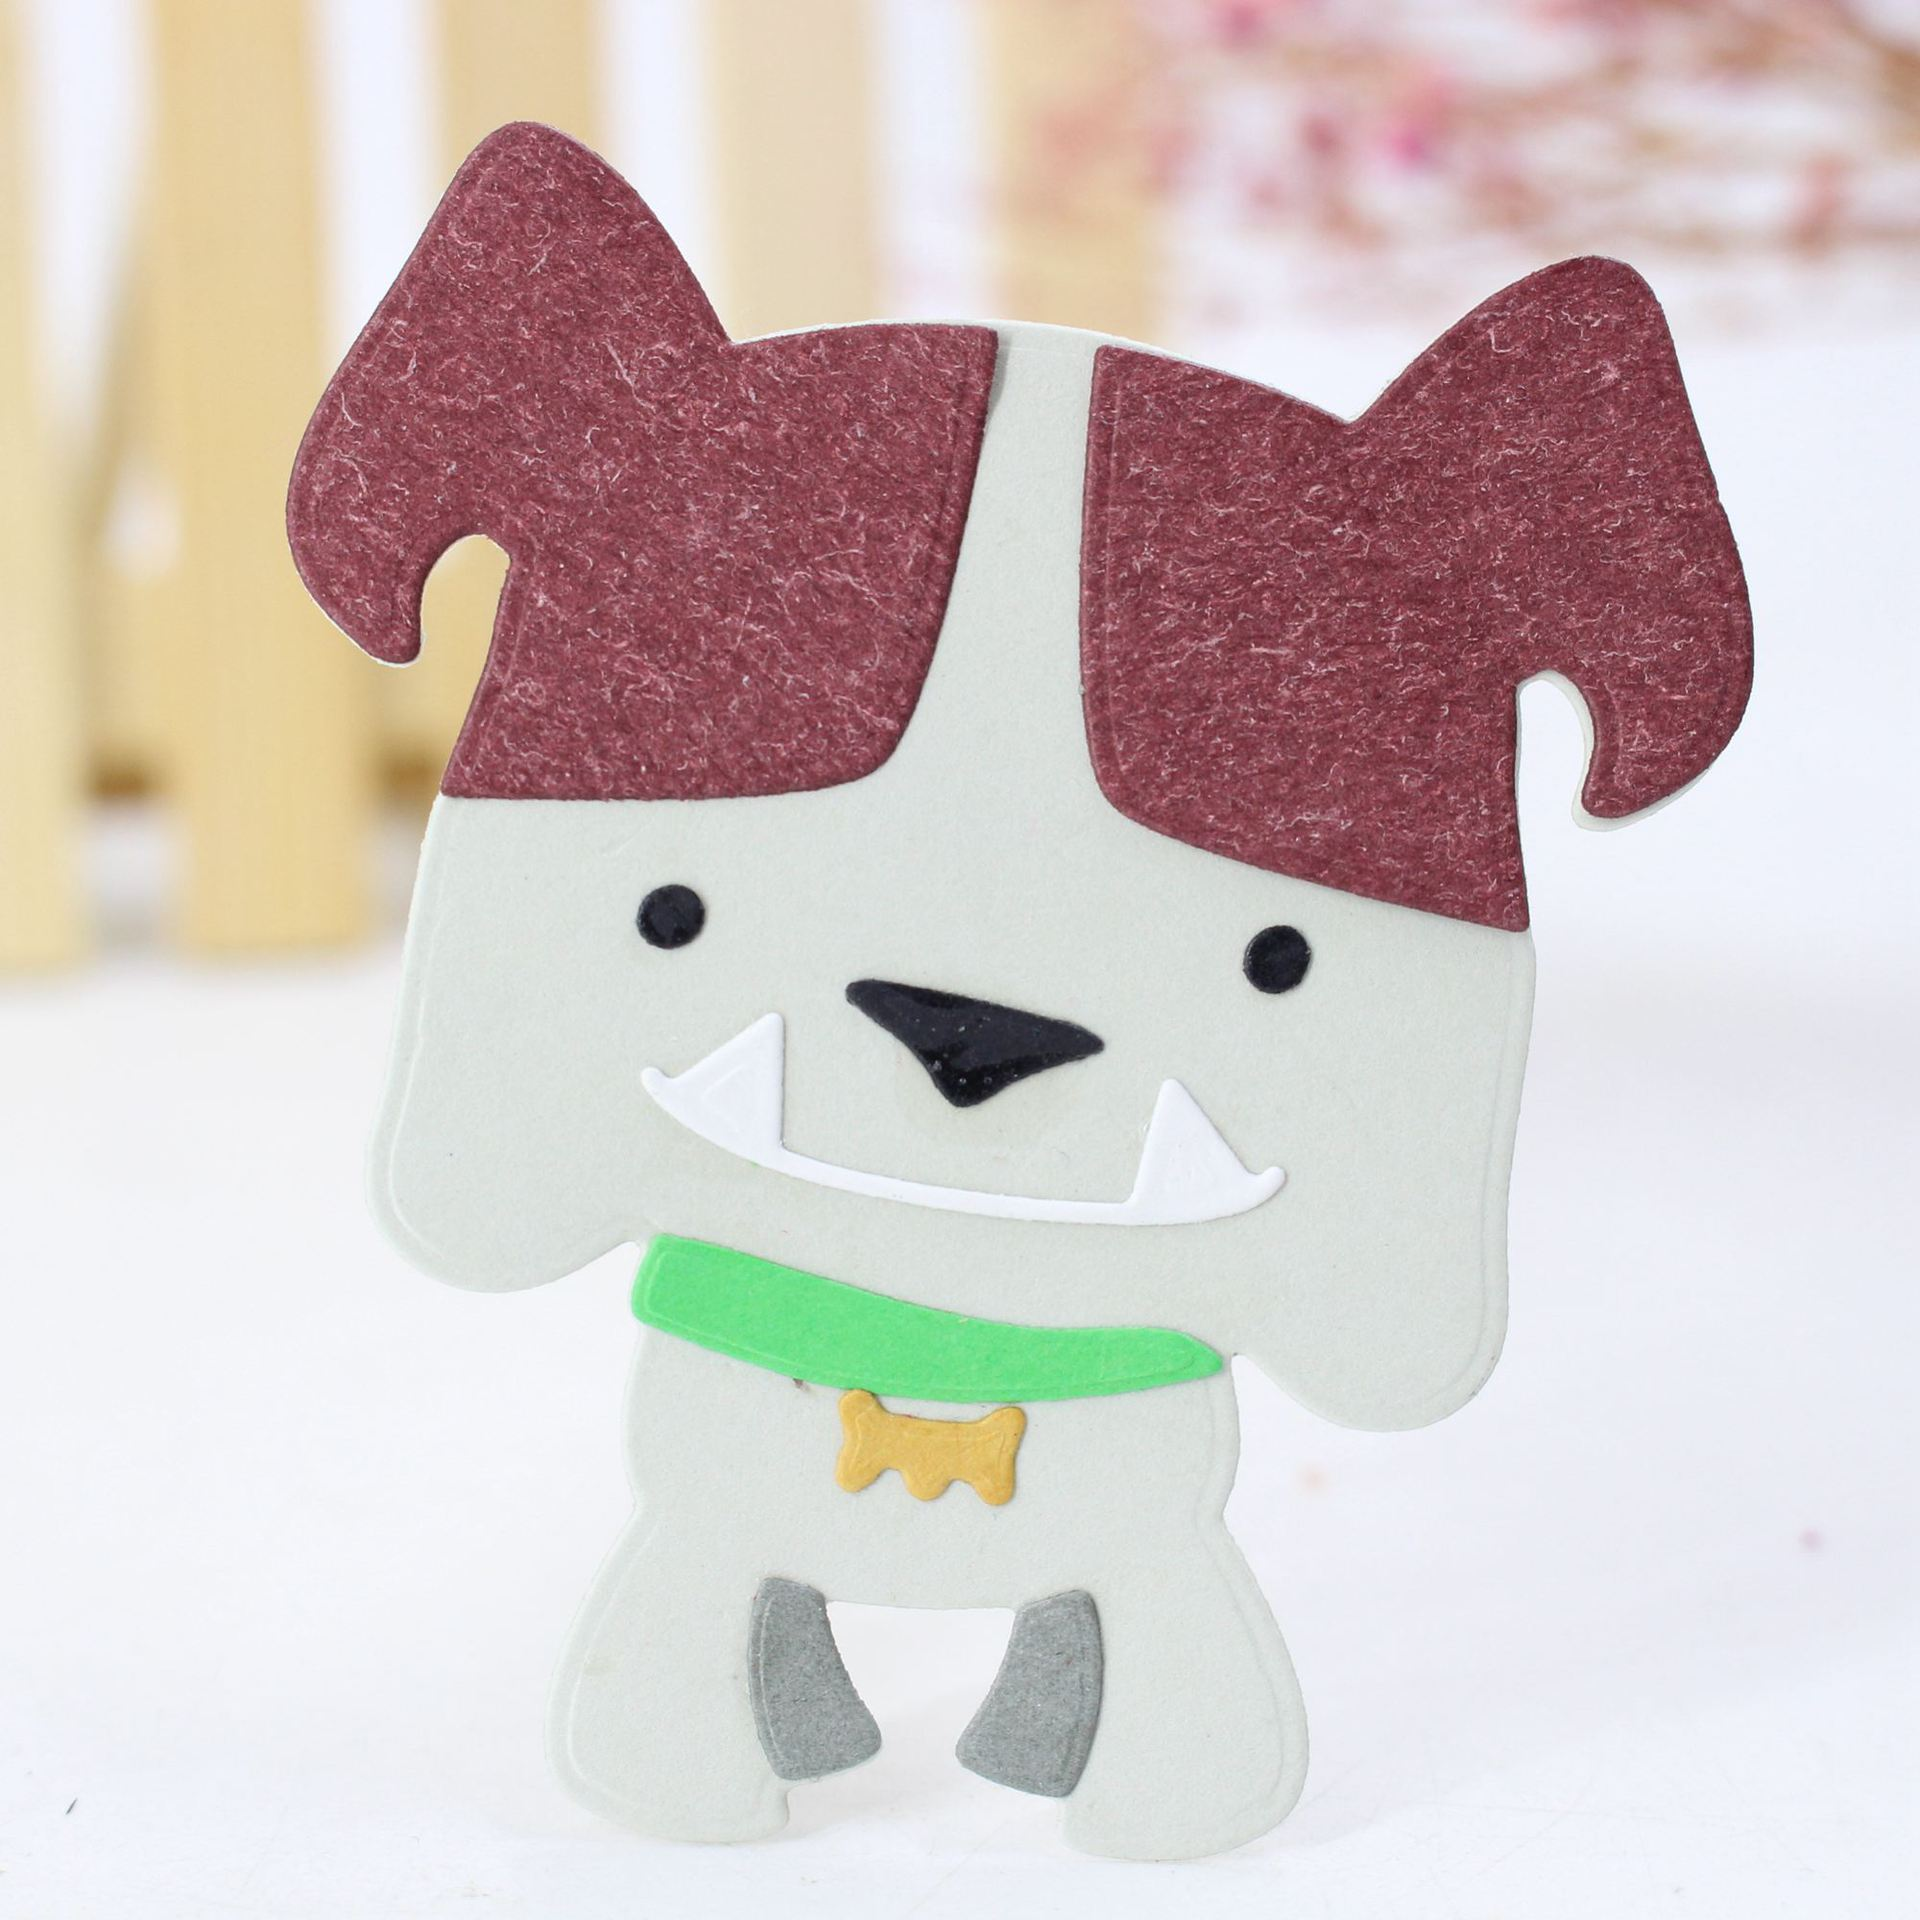 AZSG Adorable Dog Cutting Dies For DIY Scrapbooking Card Making Decorative Metal Die Cutter Decoration